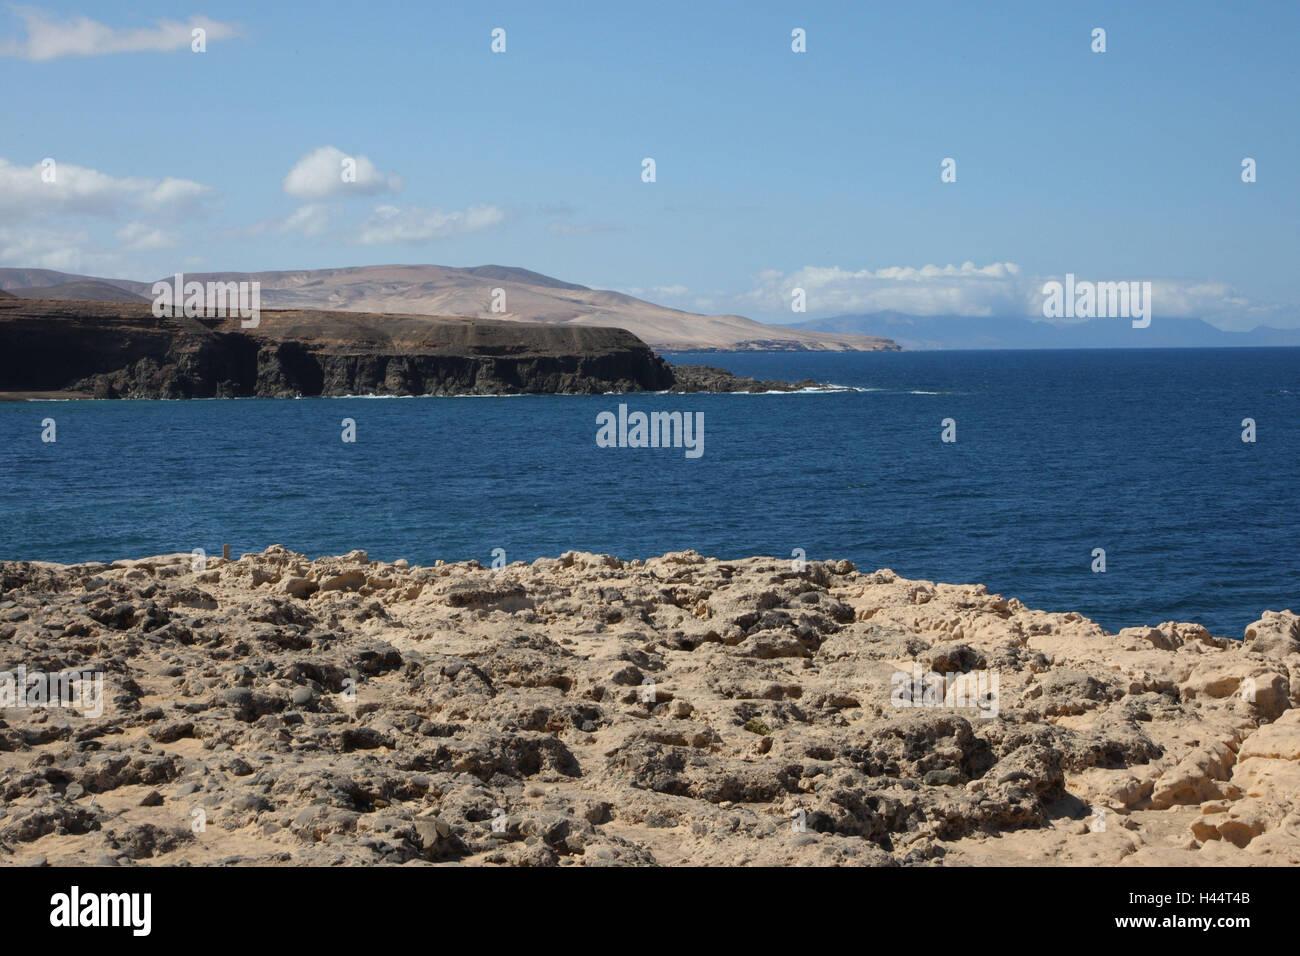 Bile coast with Puerto de la Pena on Fuerteventura, - Stock Image